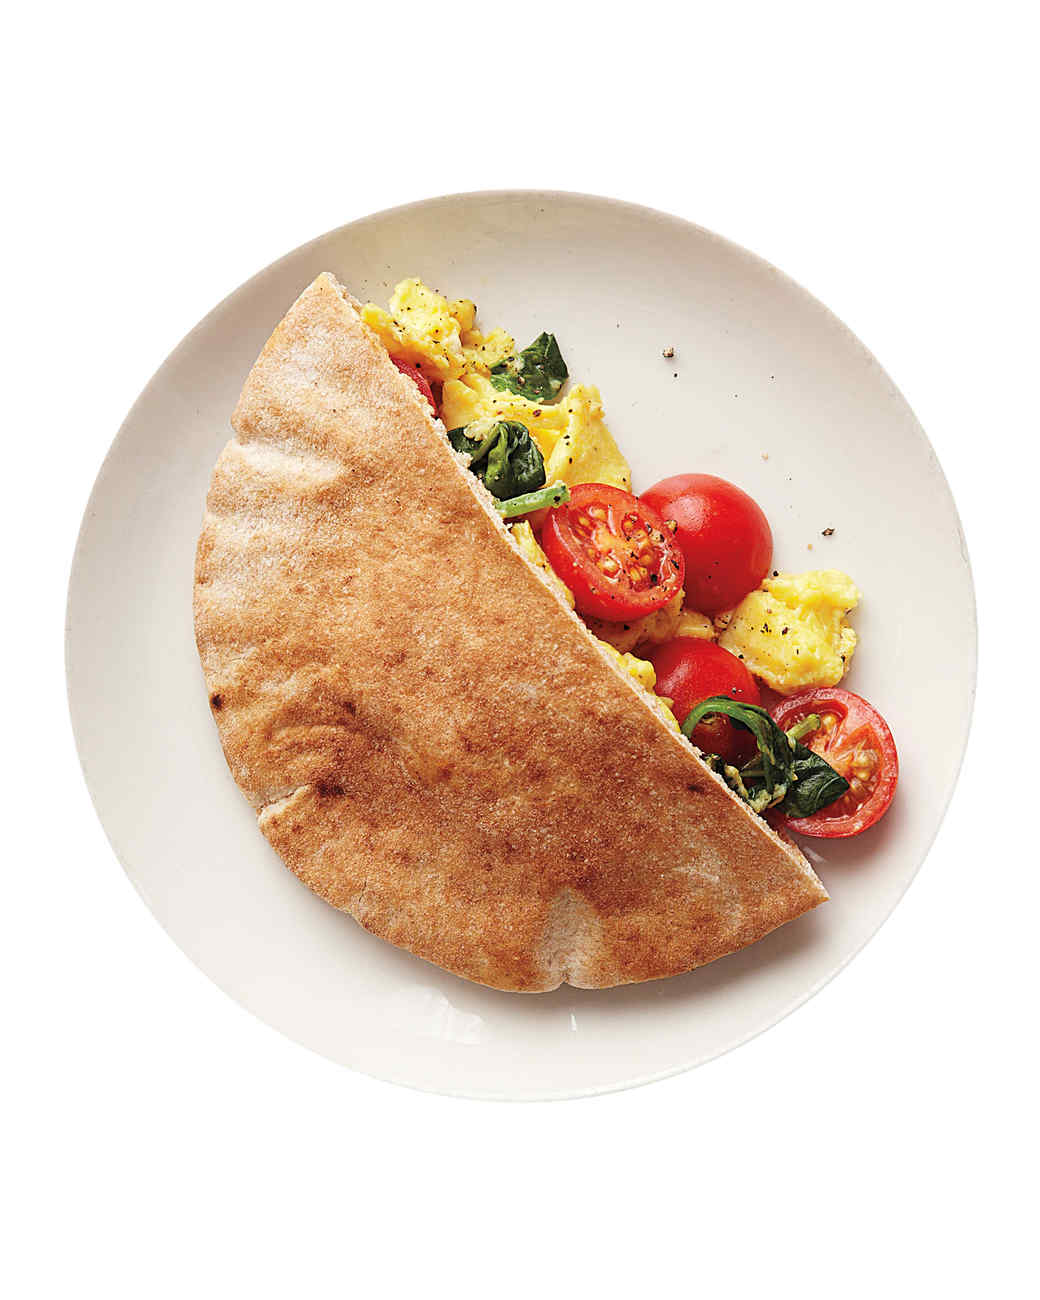 egg-spinach-pita-0911mbd107535.jpg